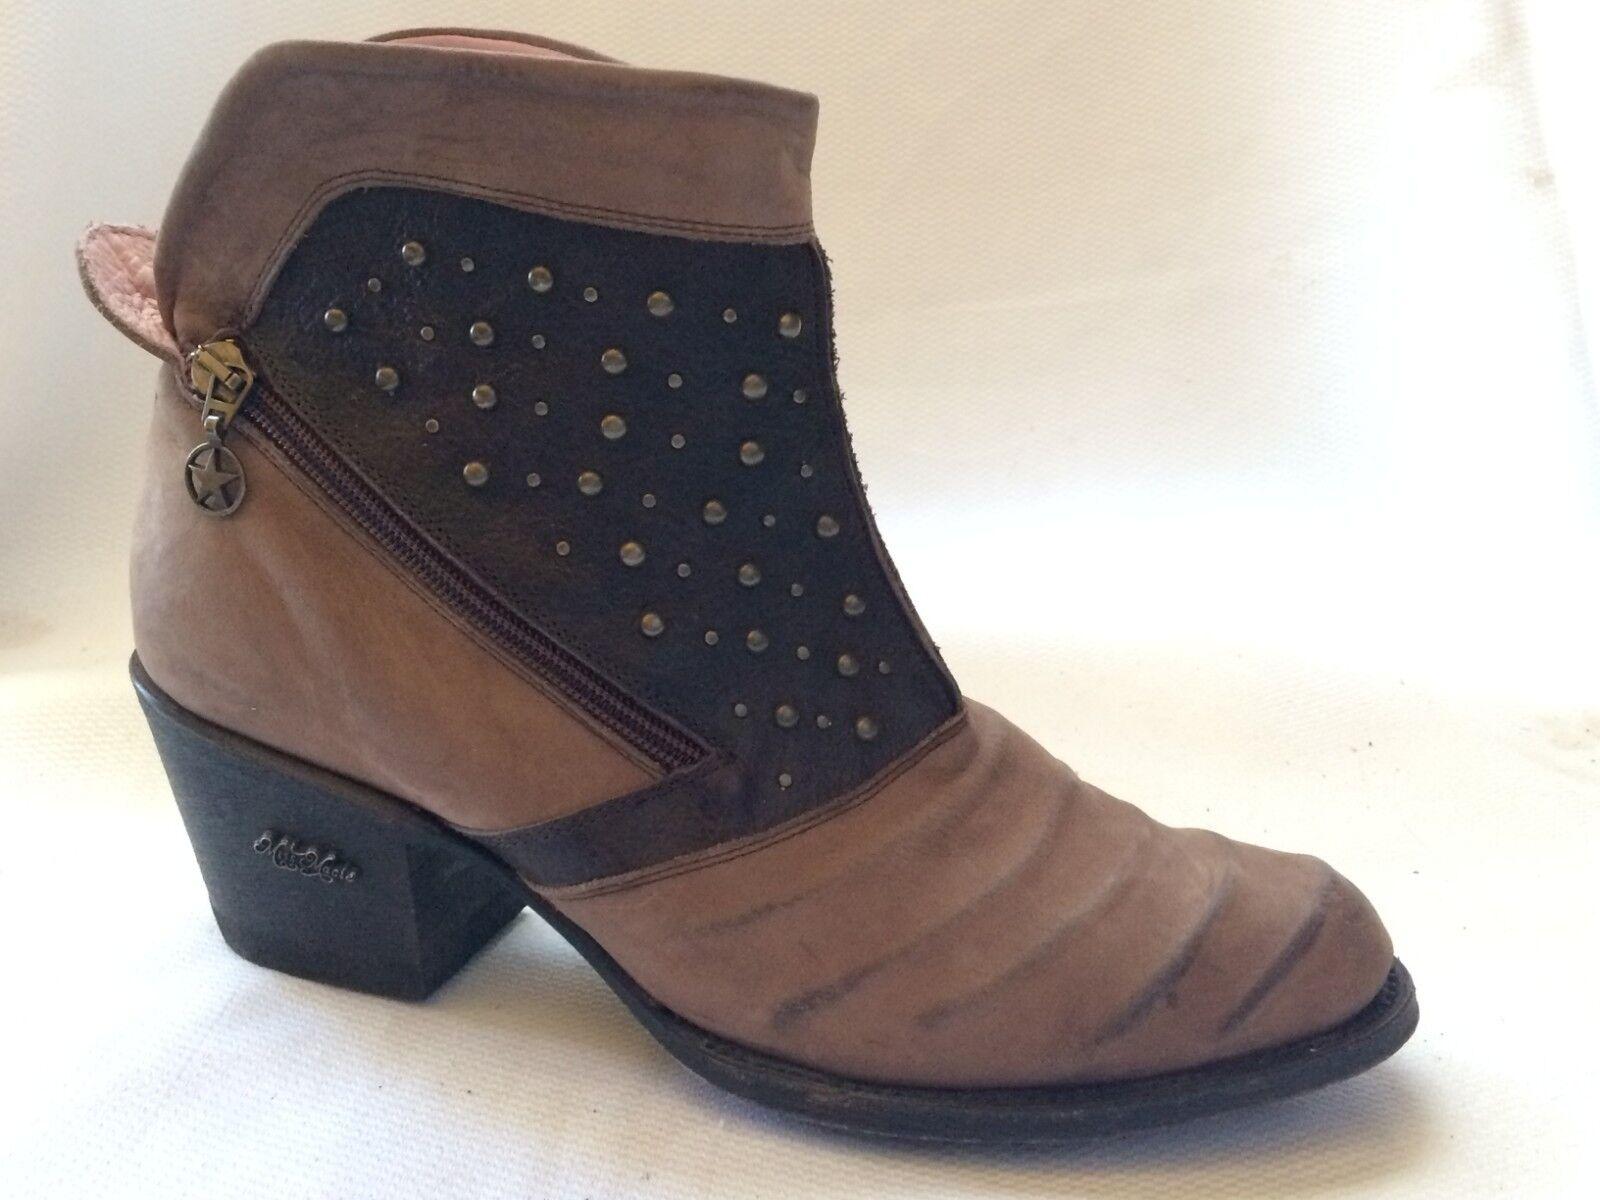 MISS MACIE Fashion Ankle démarrage femmes 10 M Piper Ribbed Dual Zipper marron U7507-01